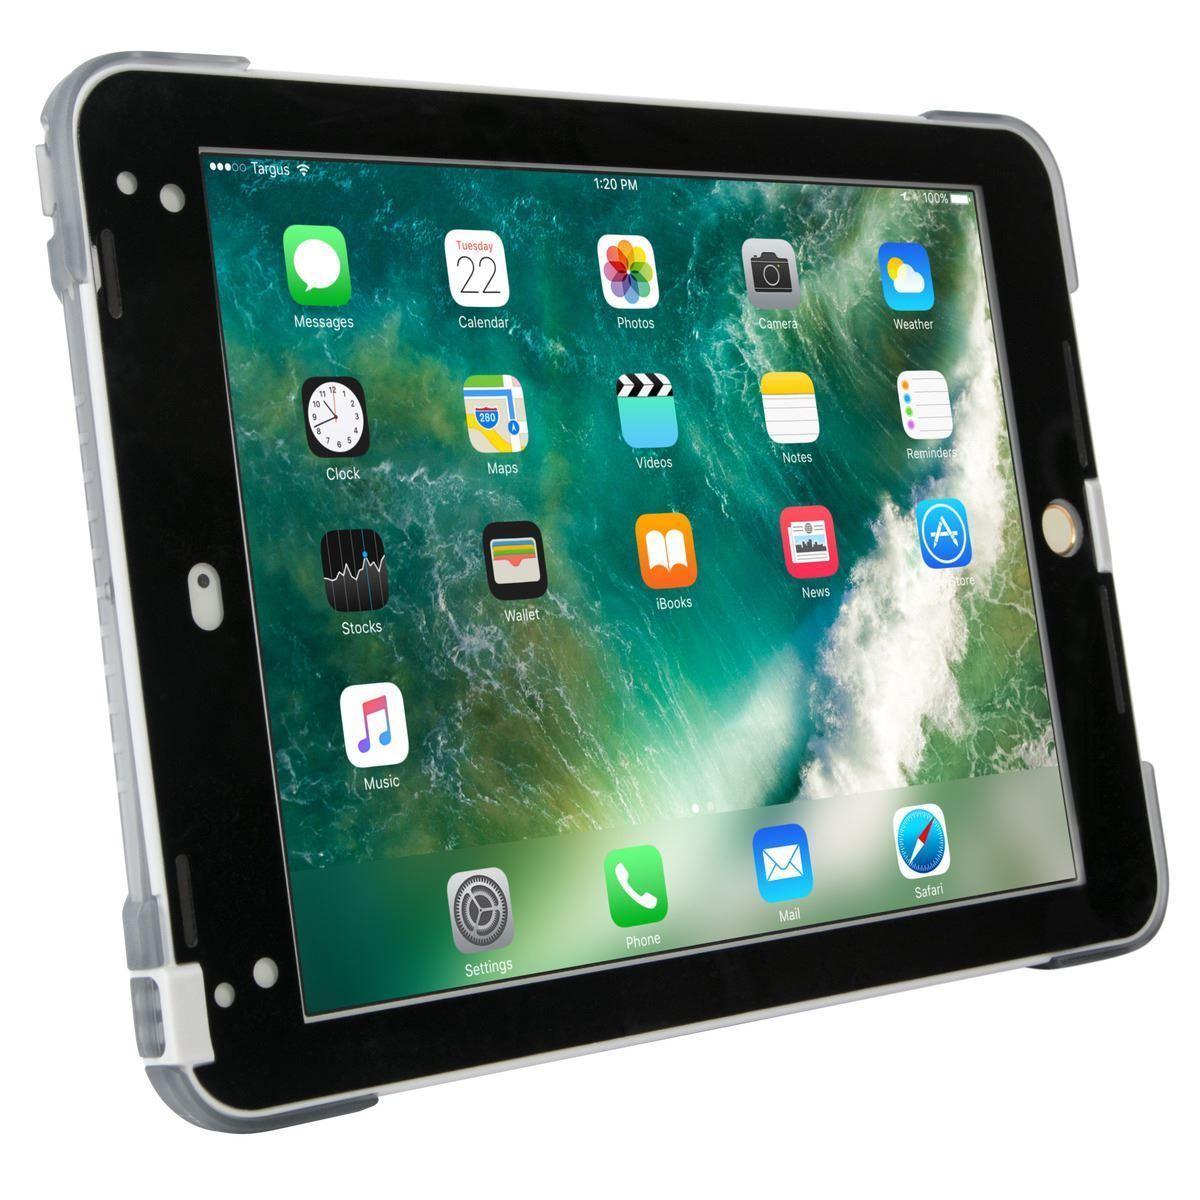 "Targus: SafePort Rugged Case for 9.7"" iPad - Grey image"